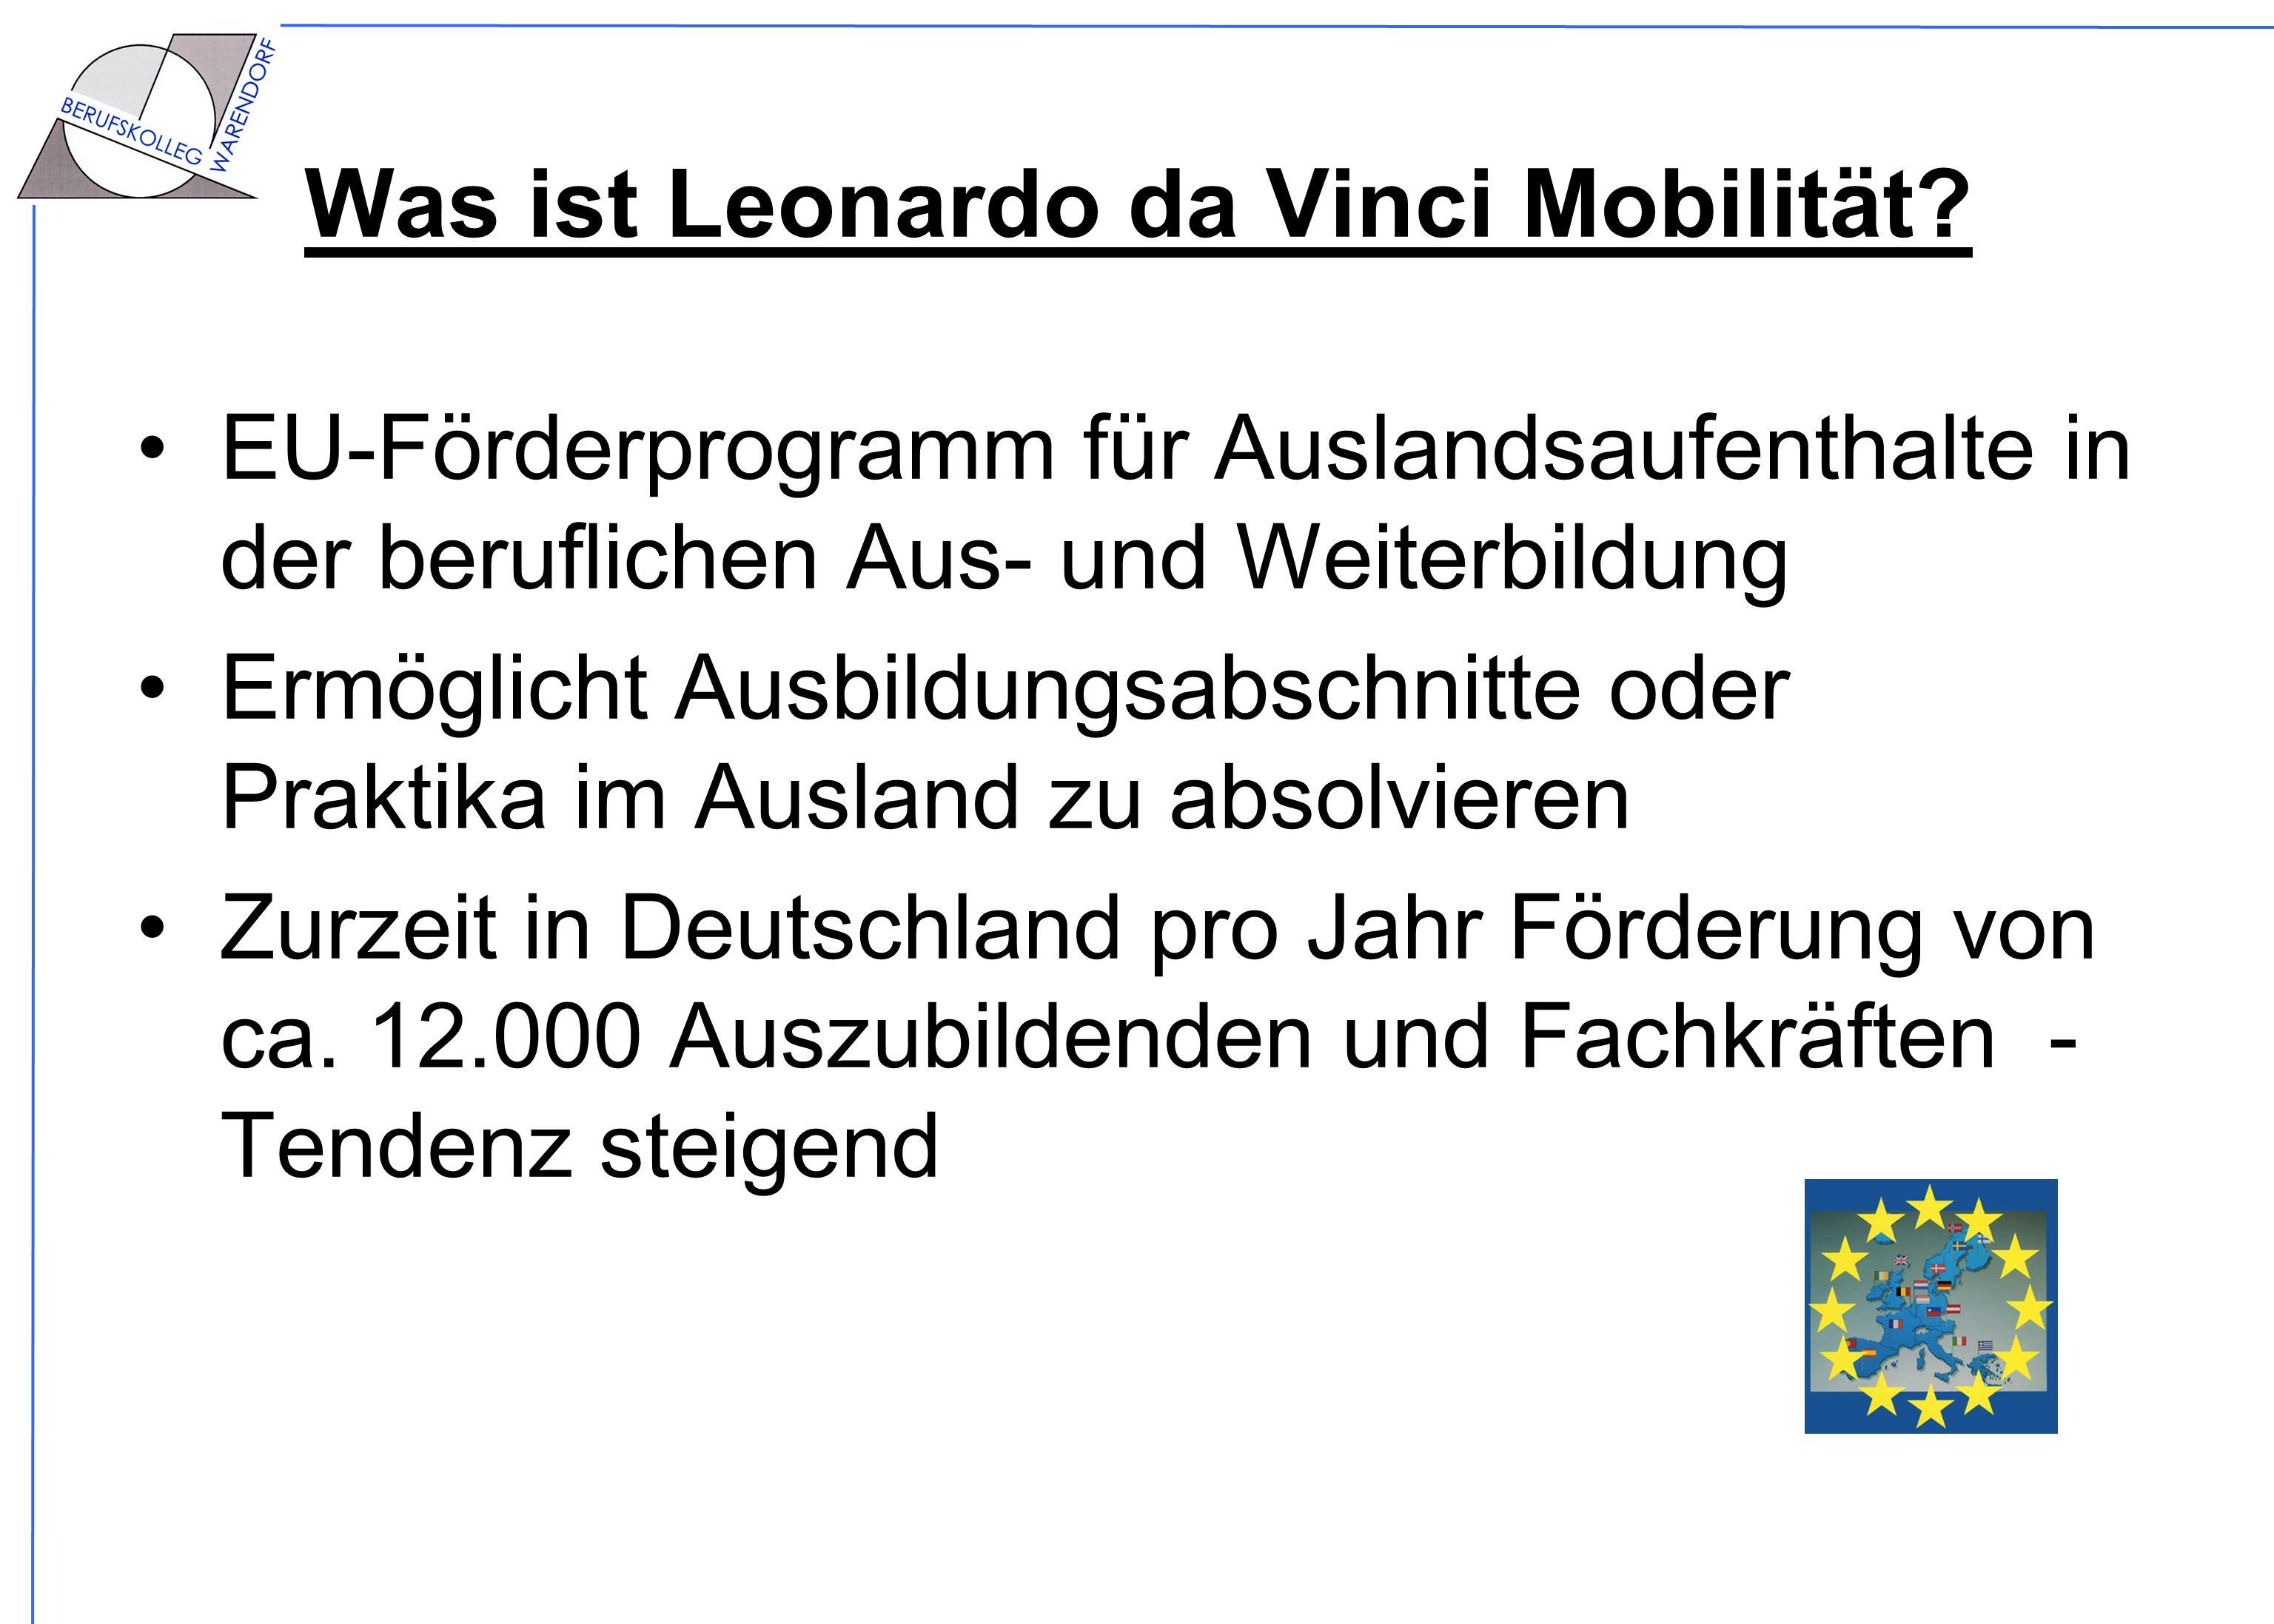 Was ist Leonardo da Vinci Mobilität